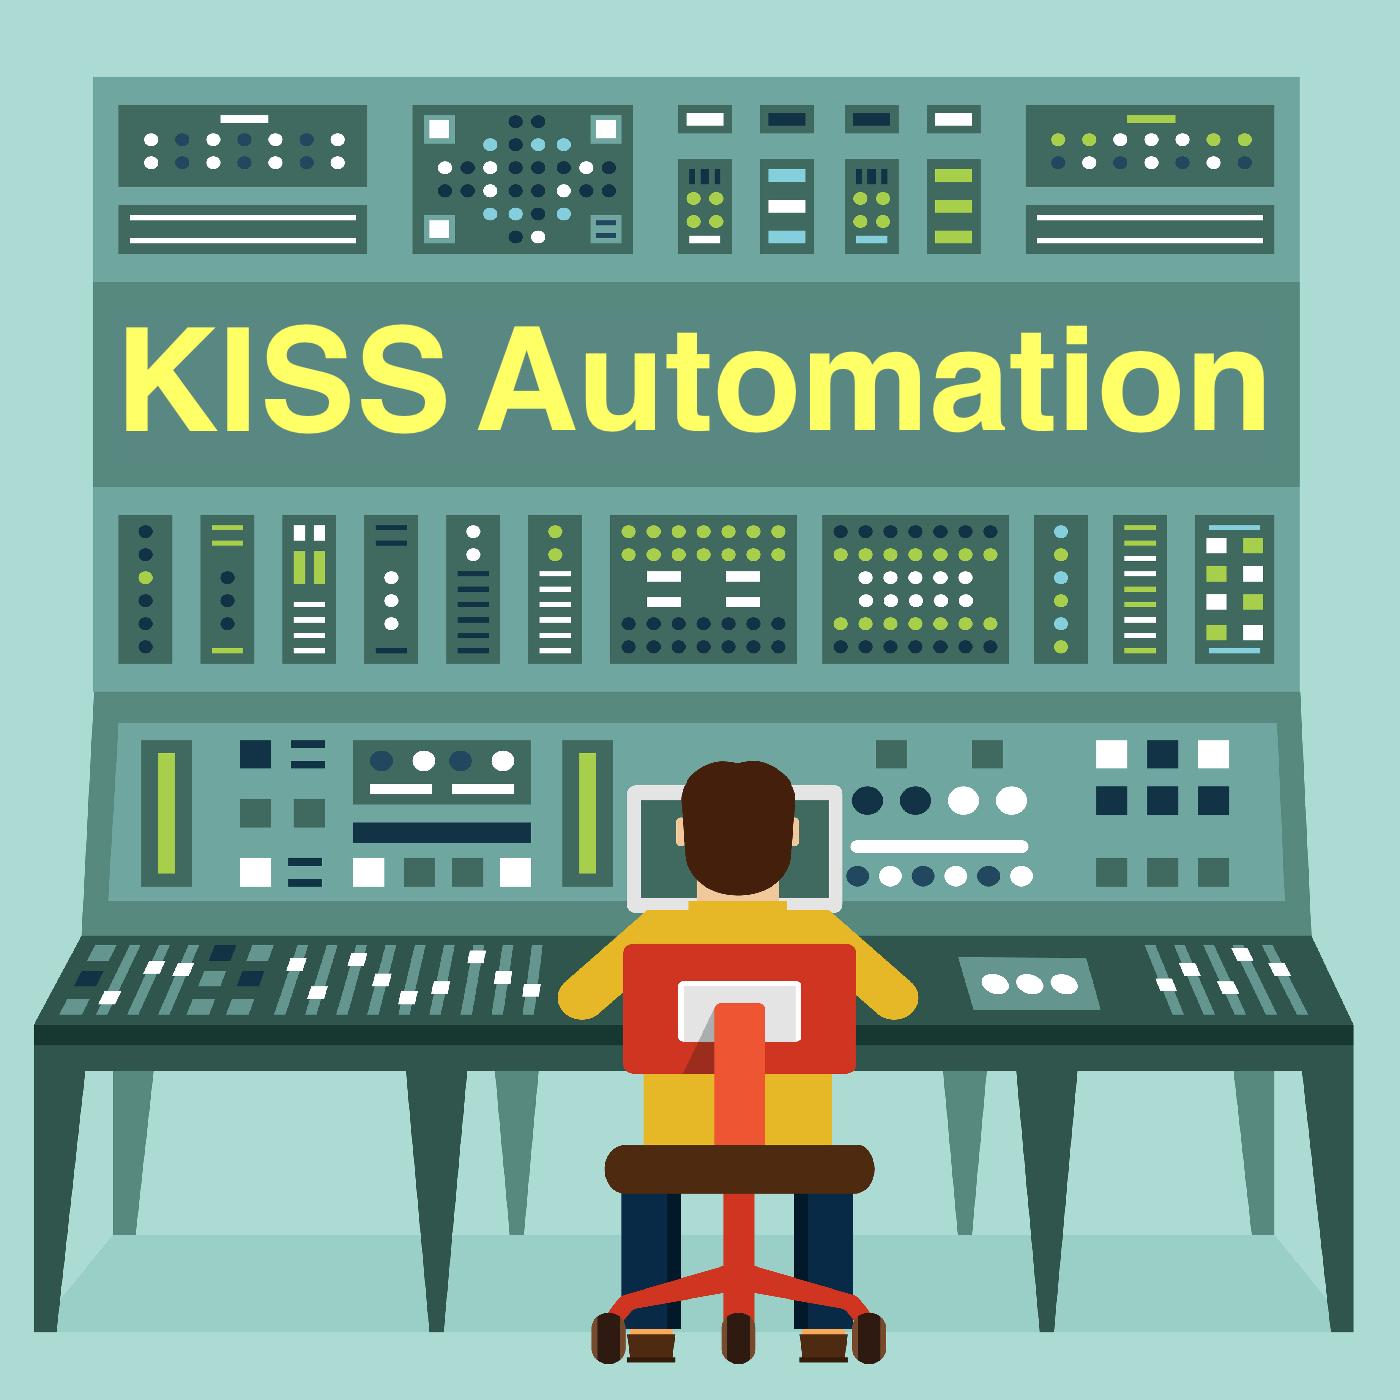 KissAutomation